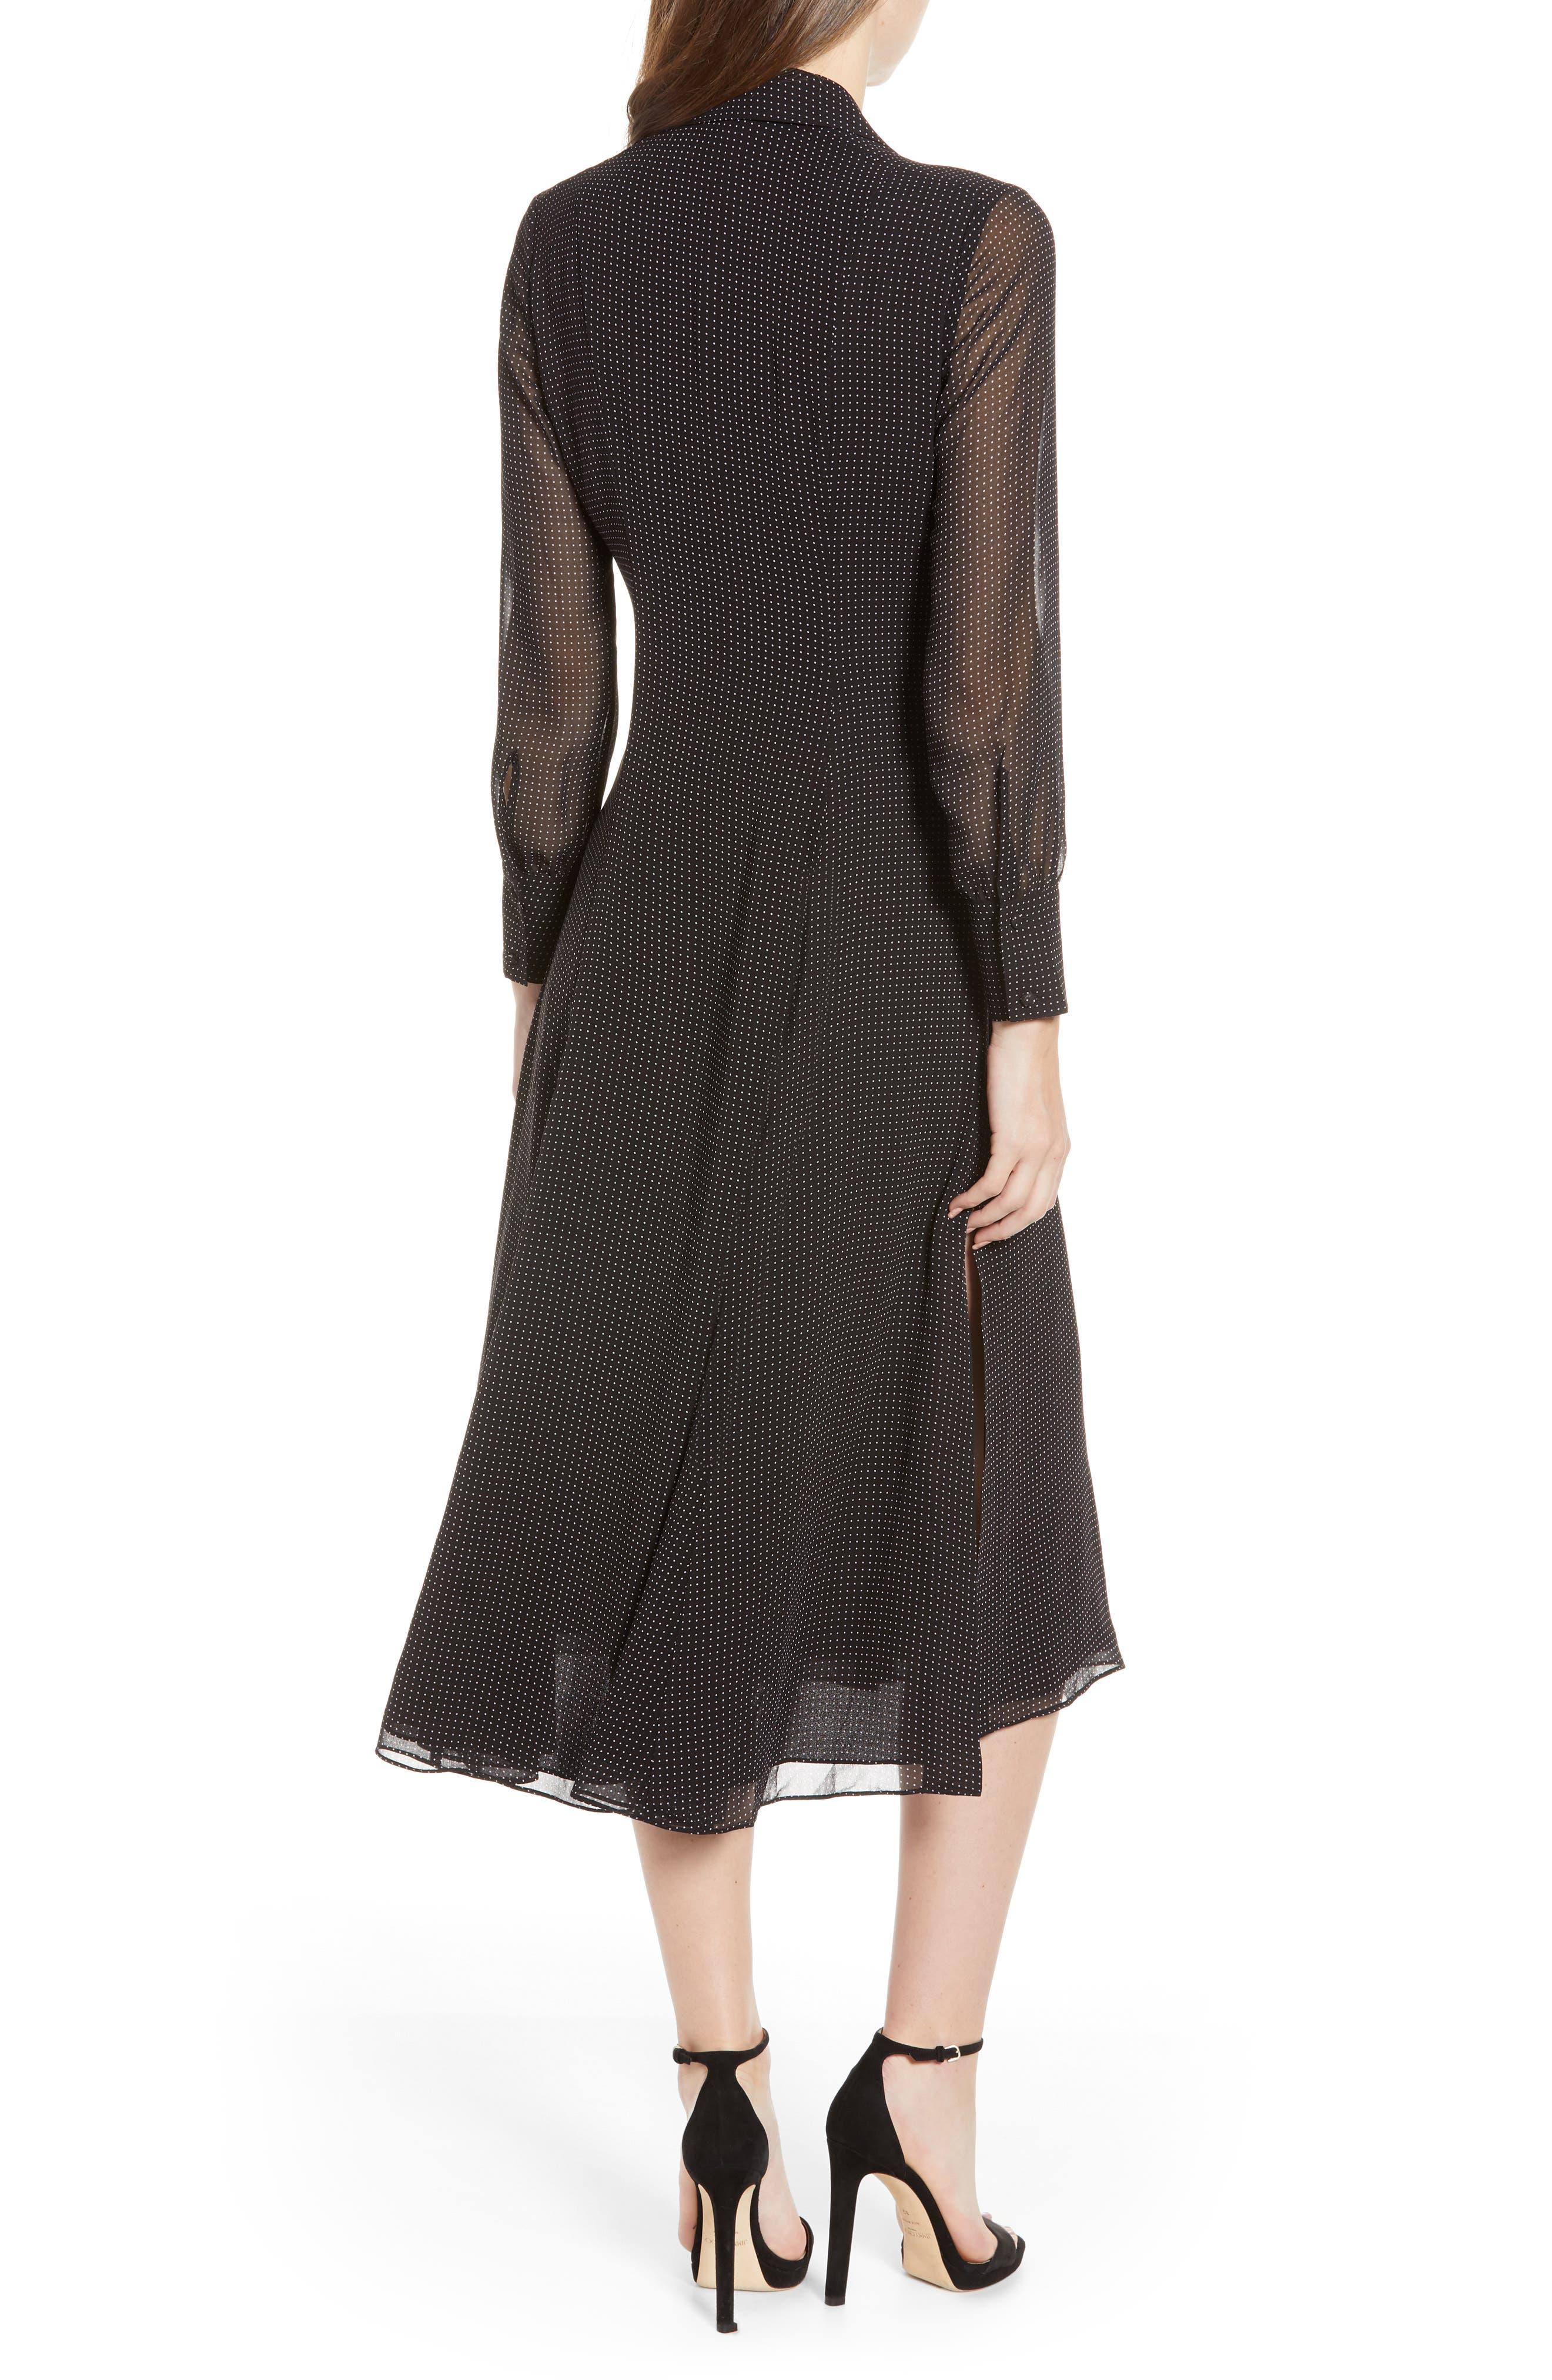 REBECCA MINKOFF,                             Kimberly Dot Sheer Sleeve Dress,                             Alternate thumbnail 2, color,                             BLACK/ WHITE